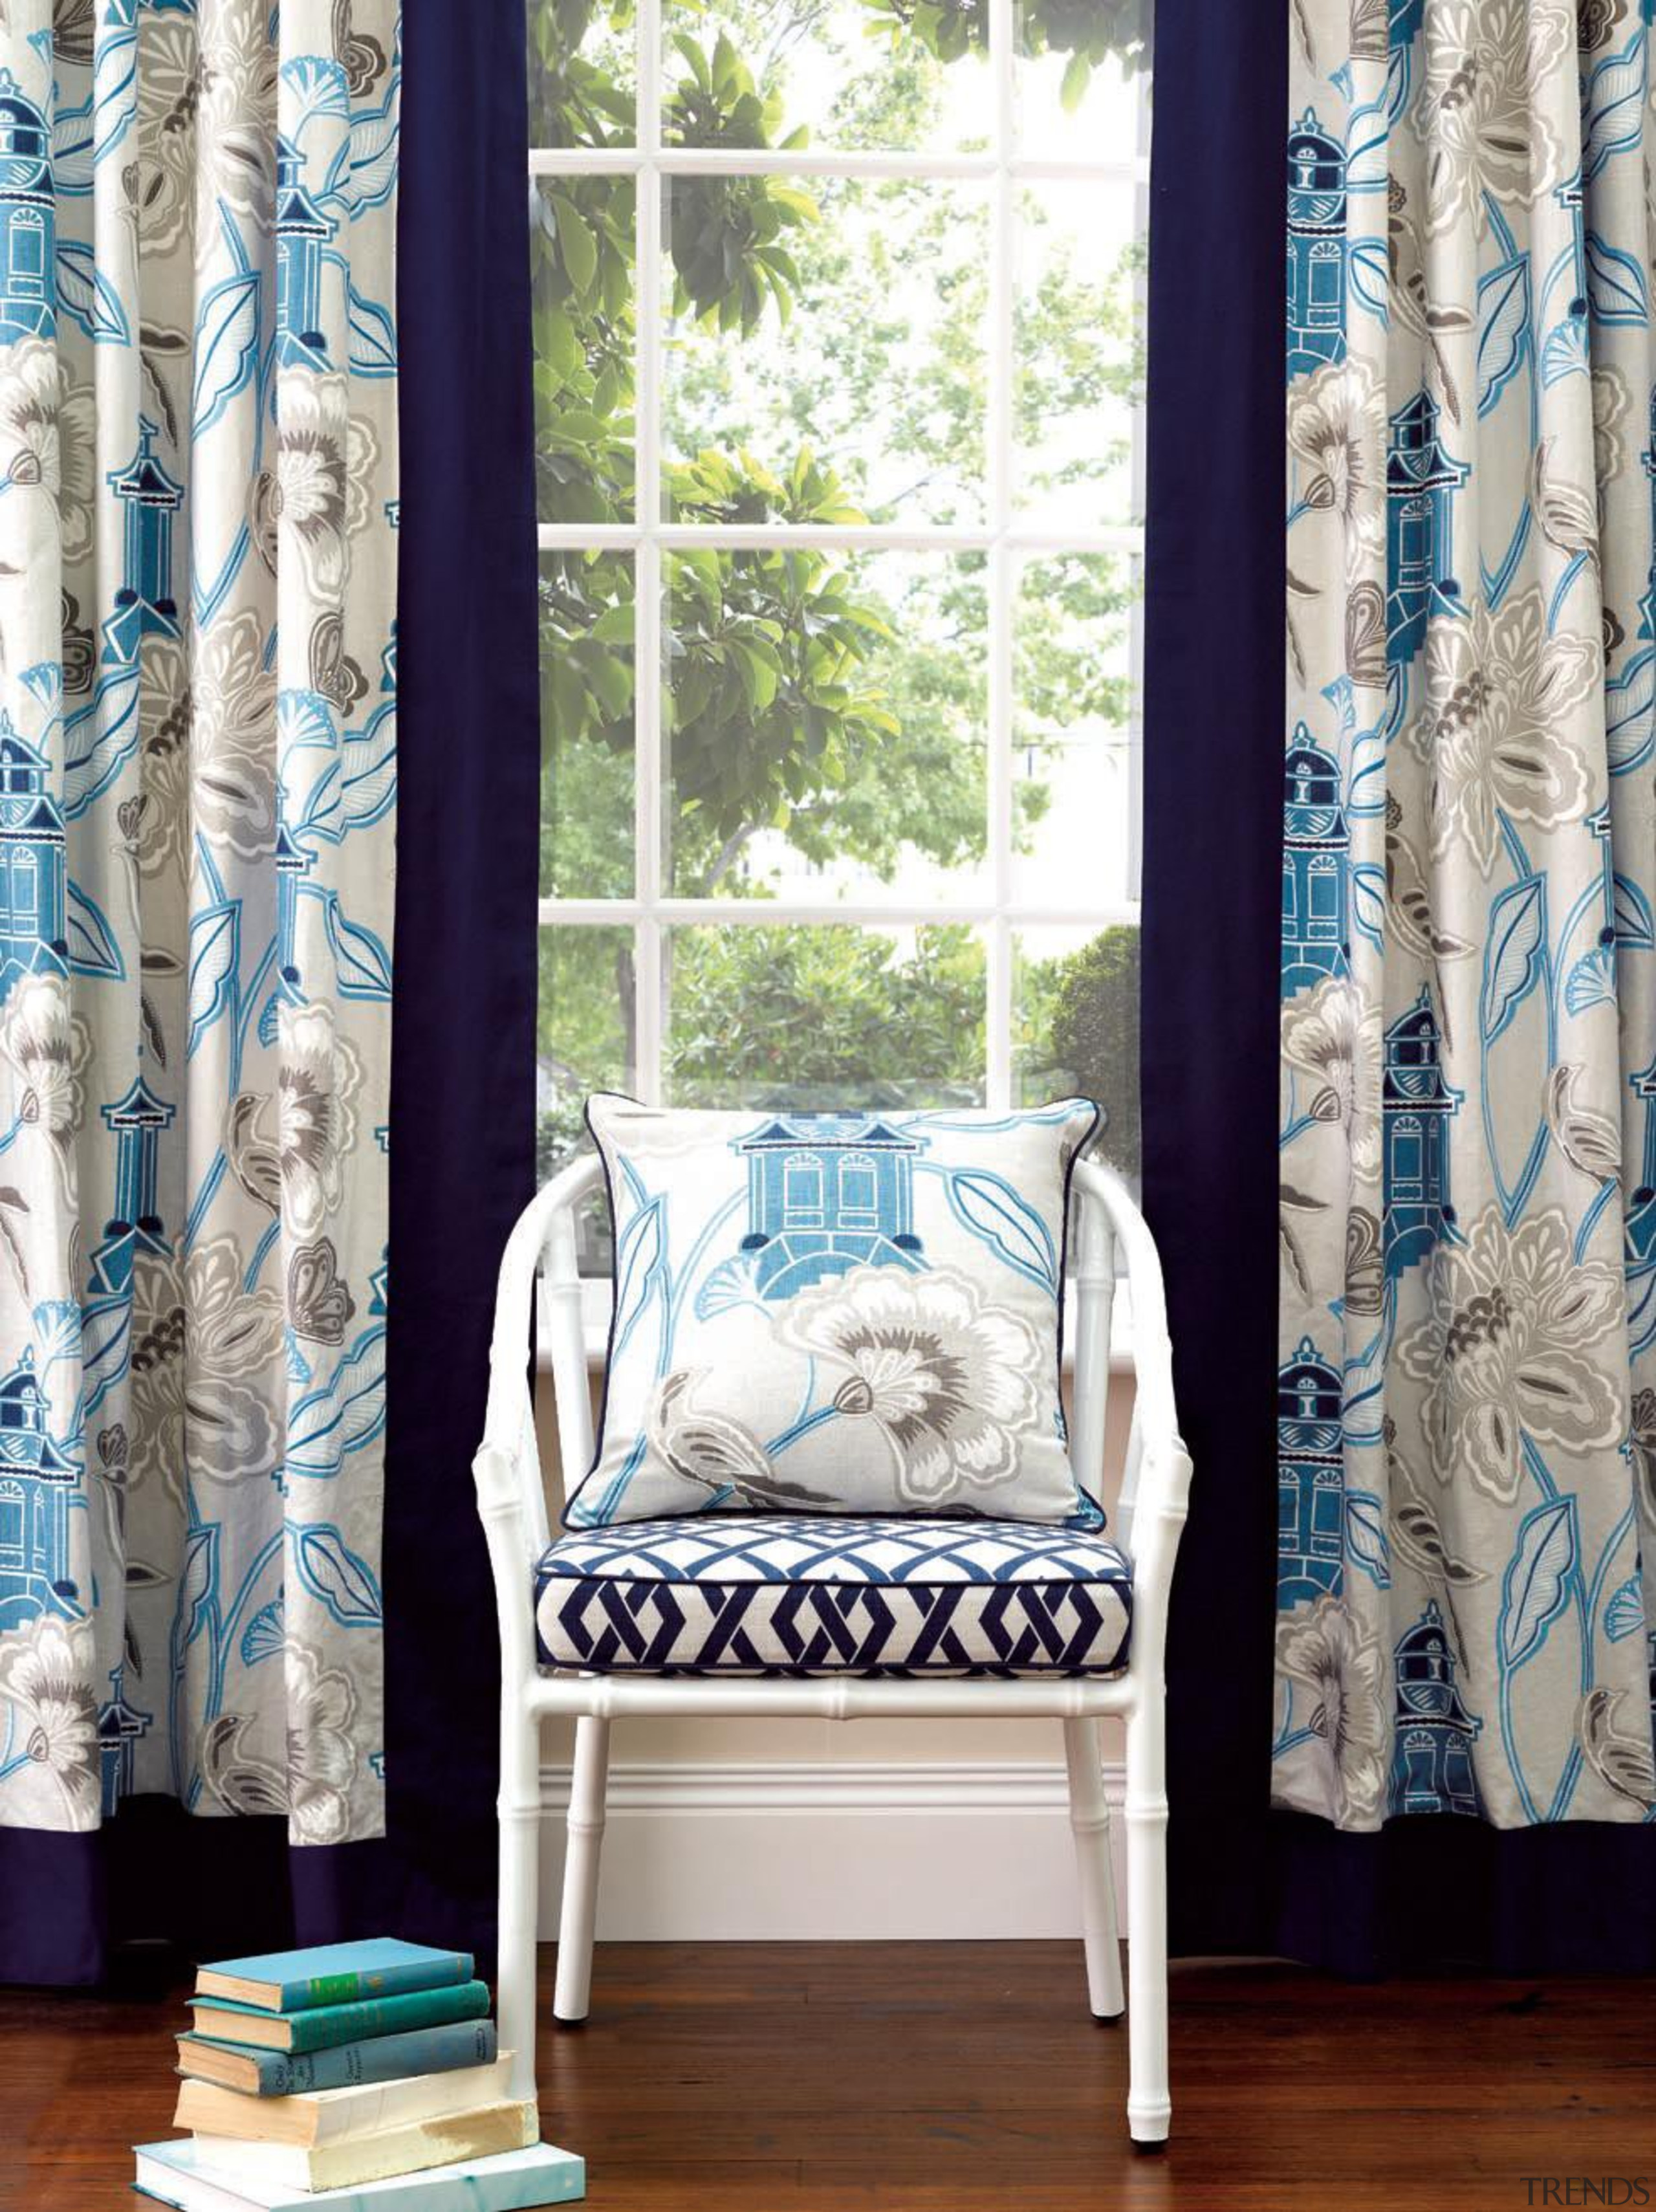 Lantern Garden - Lantern Garden - blue | blue, chair, curtain, decor, furniture, home, interior design, living room, product, room, textile, window, window blind, window covering, window treatment, white